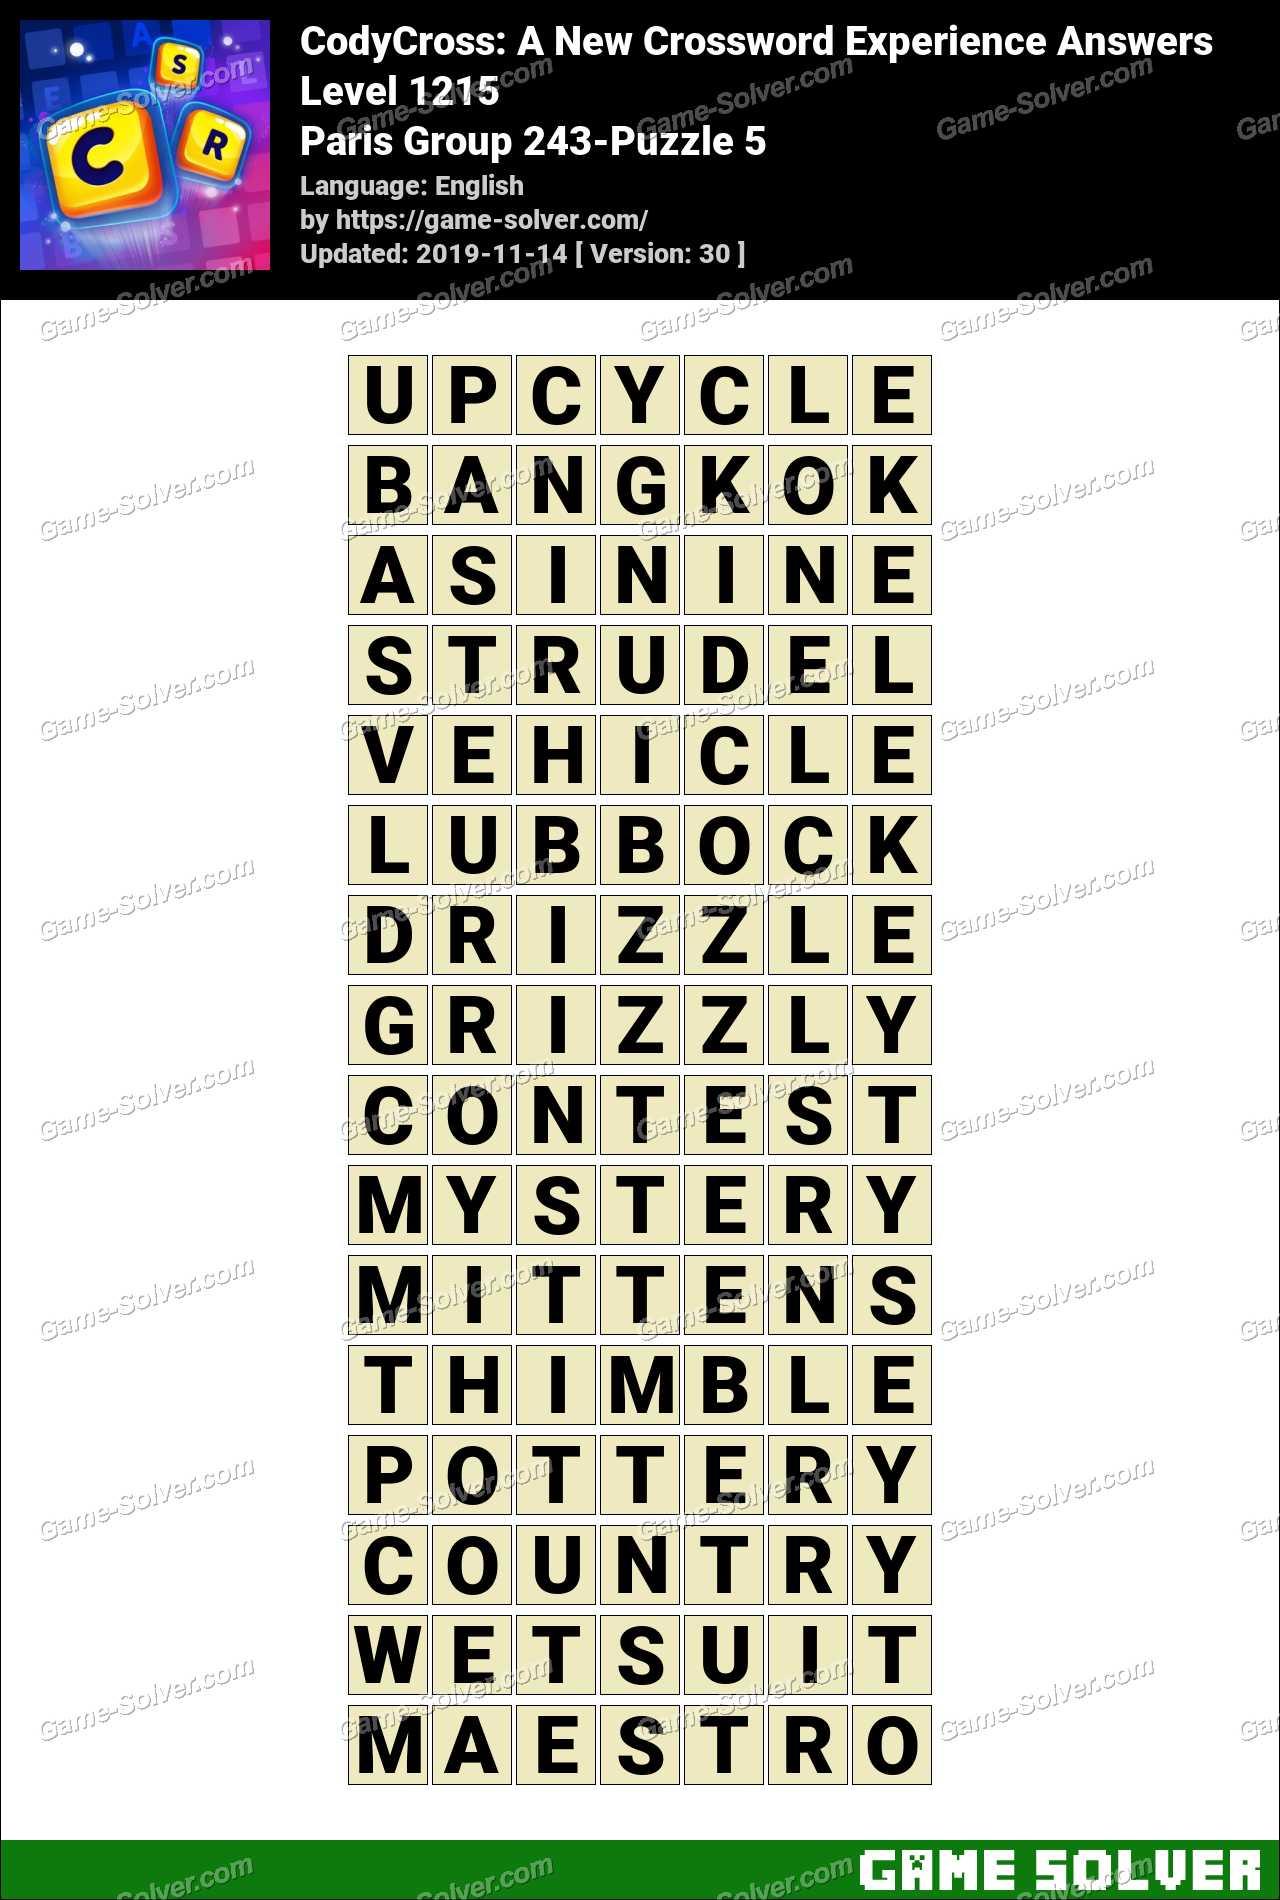 CodyCross Paris Group 243-Puzzle 5 Answers